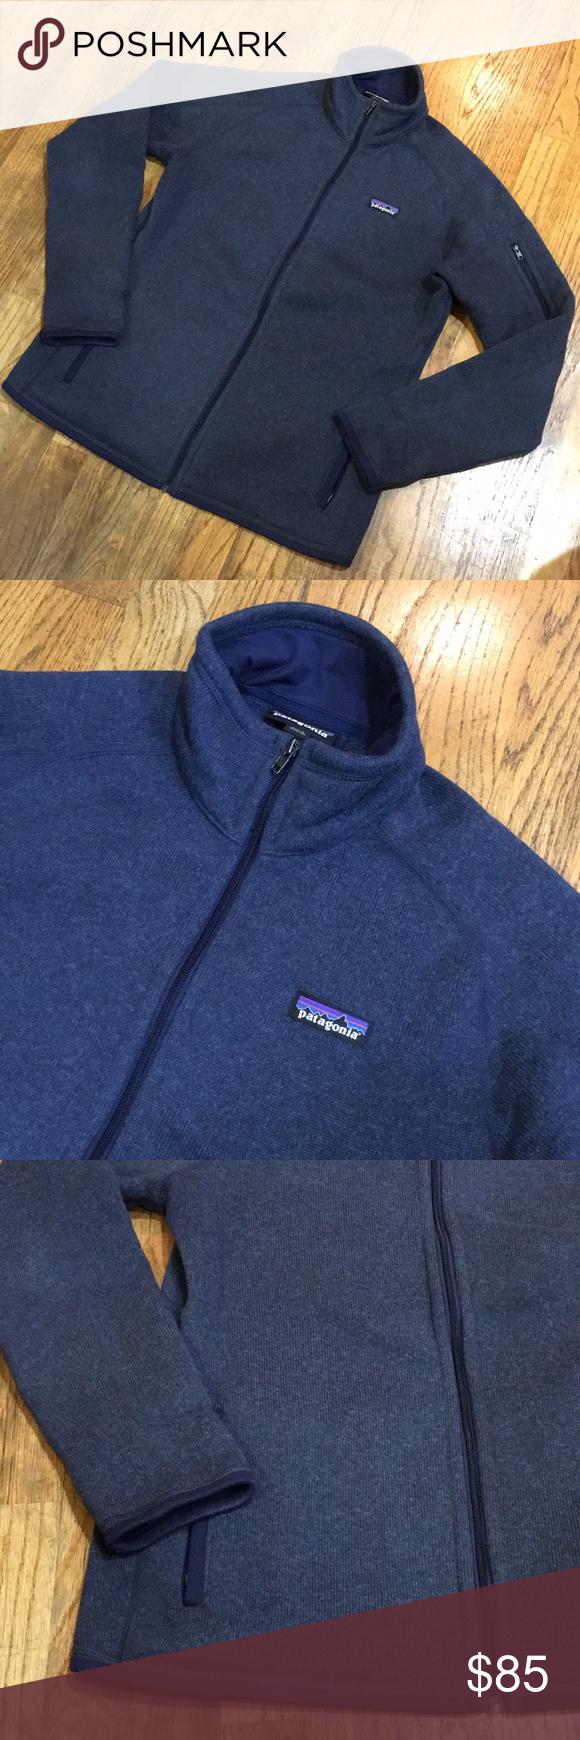 Patagonia Better Sweater | Patagonia better sweater, Cool ...